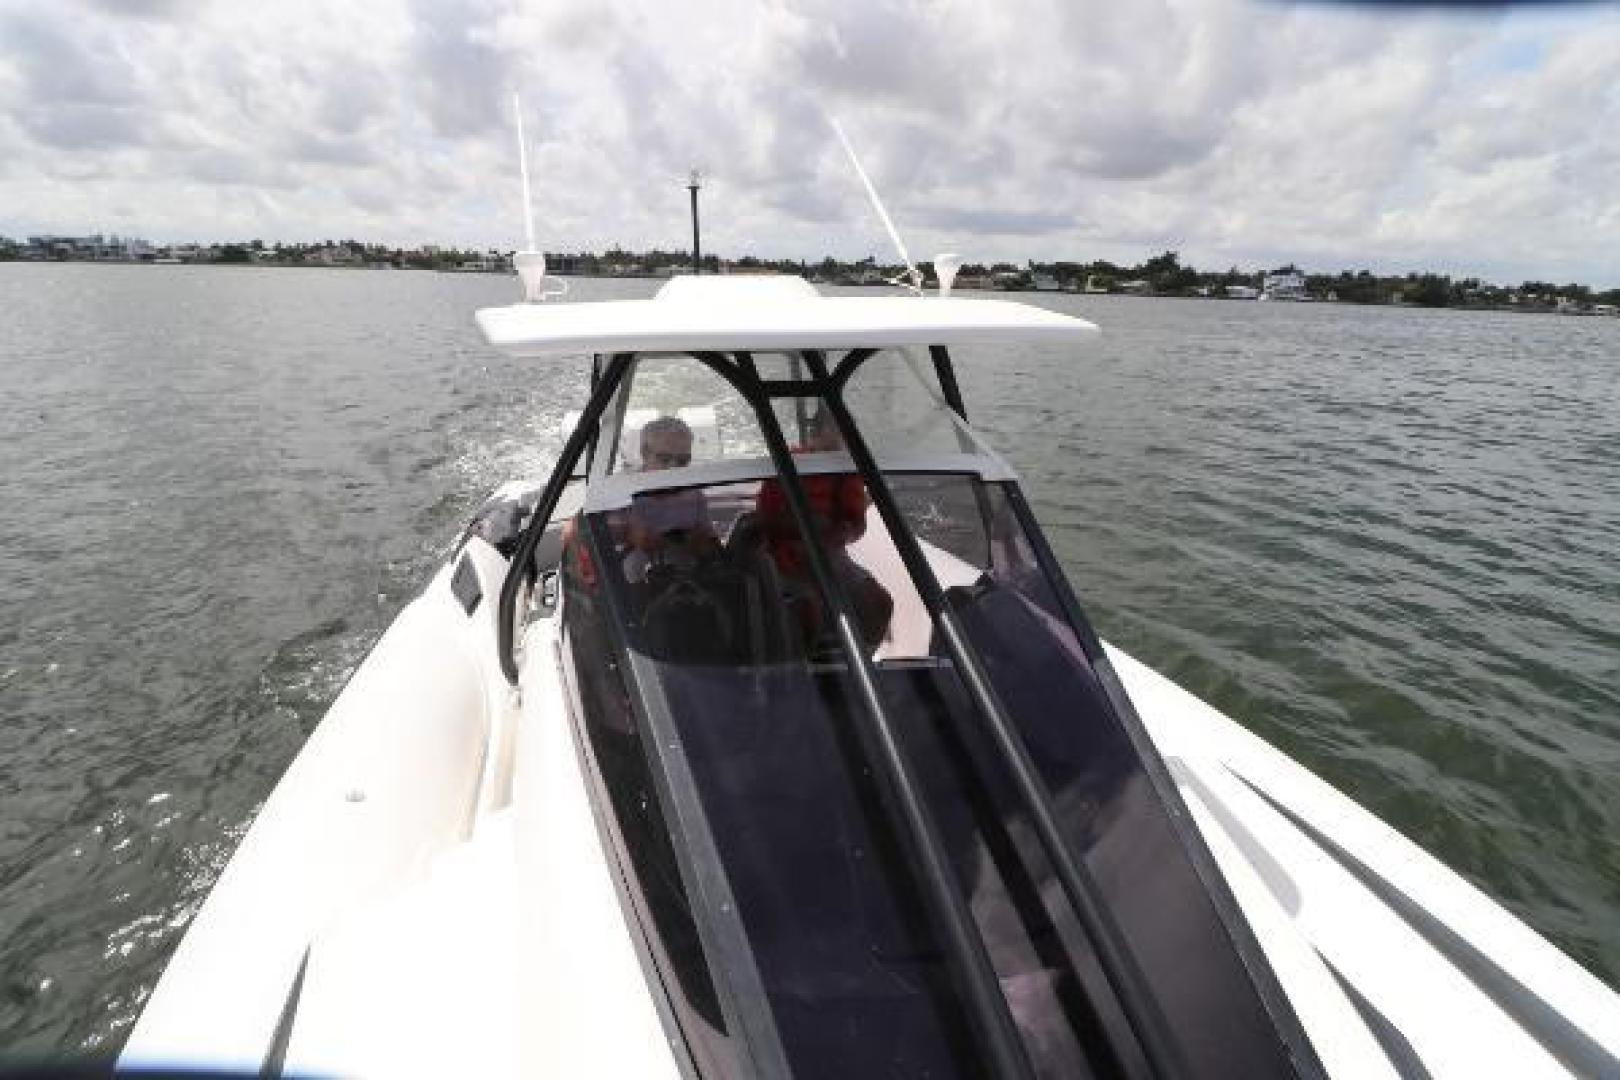 Sacs-Strider 40 ESSE R 2016-Sacs Strider 40 ESSE R Fort Lauderdale-Florida-United States-1533416   Thumbnail